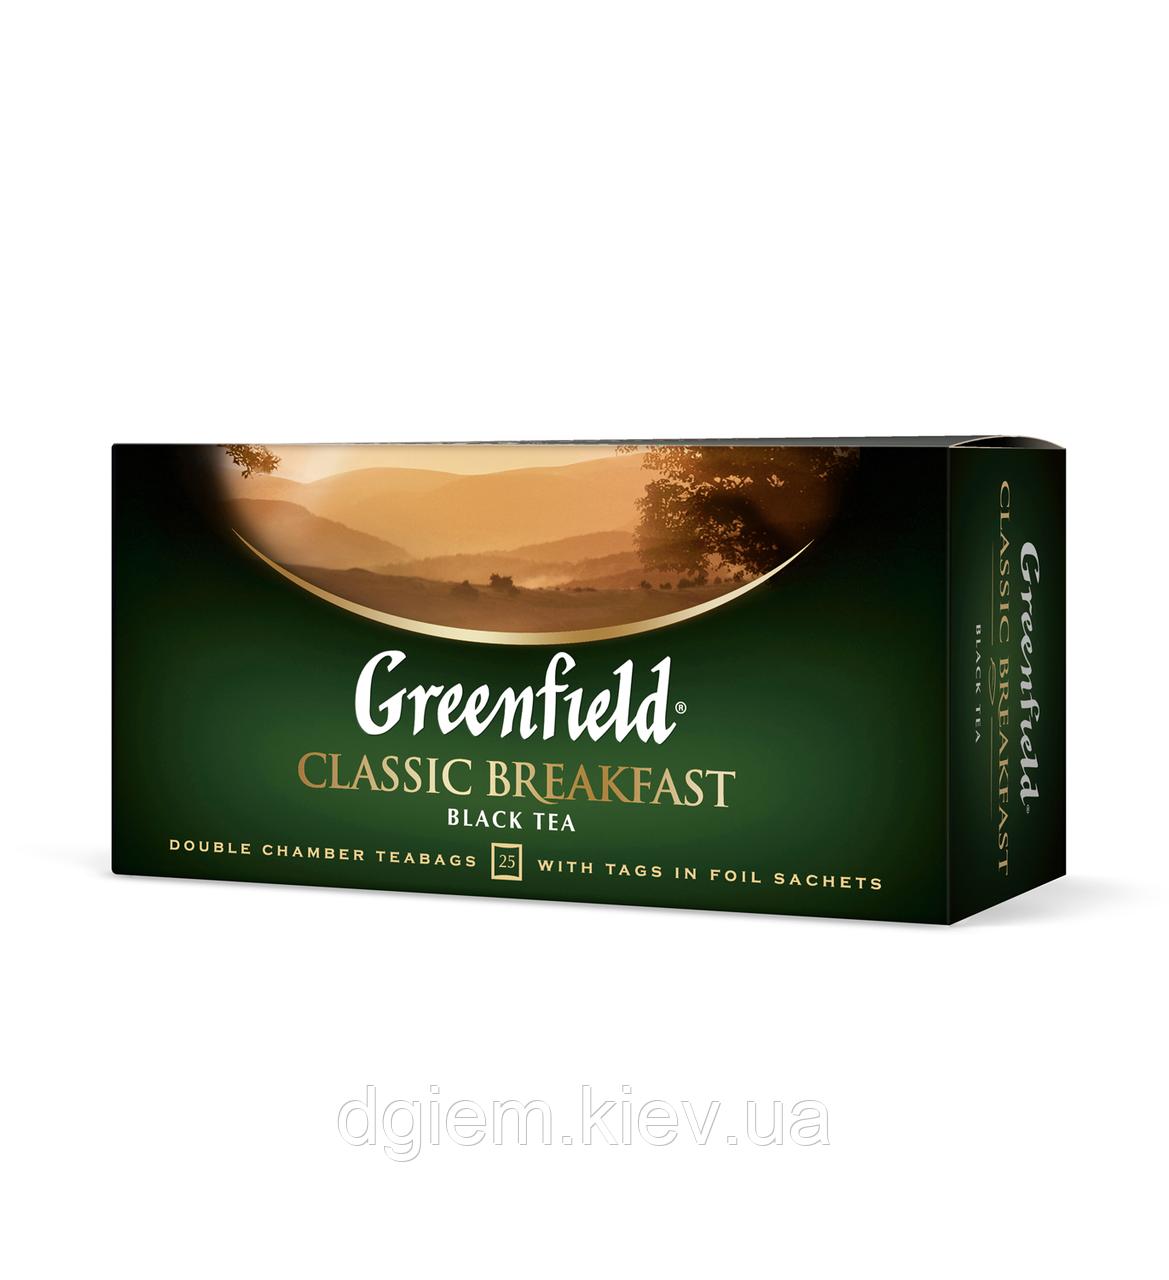 "Чай черный CLASSIC BREAKFAST 2гх25шт. ""Greenfield"" , пакет"